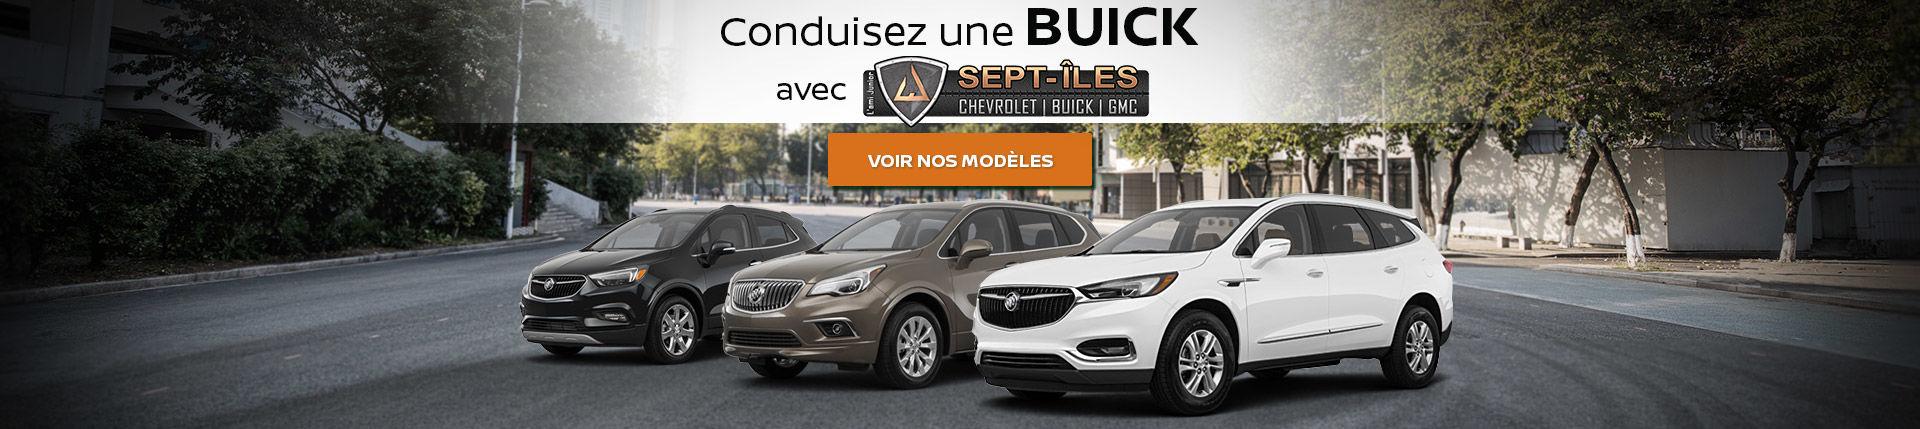 Buick Sept-Îles